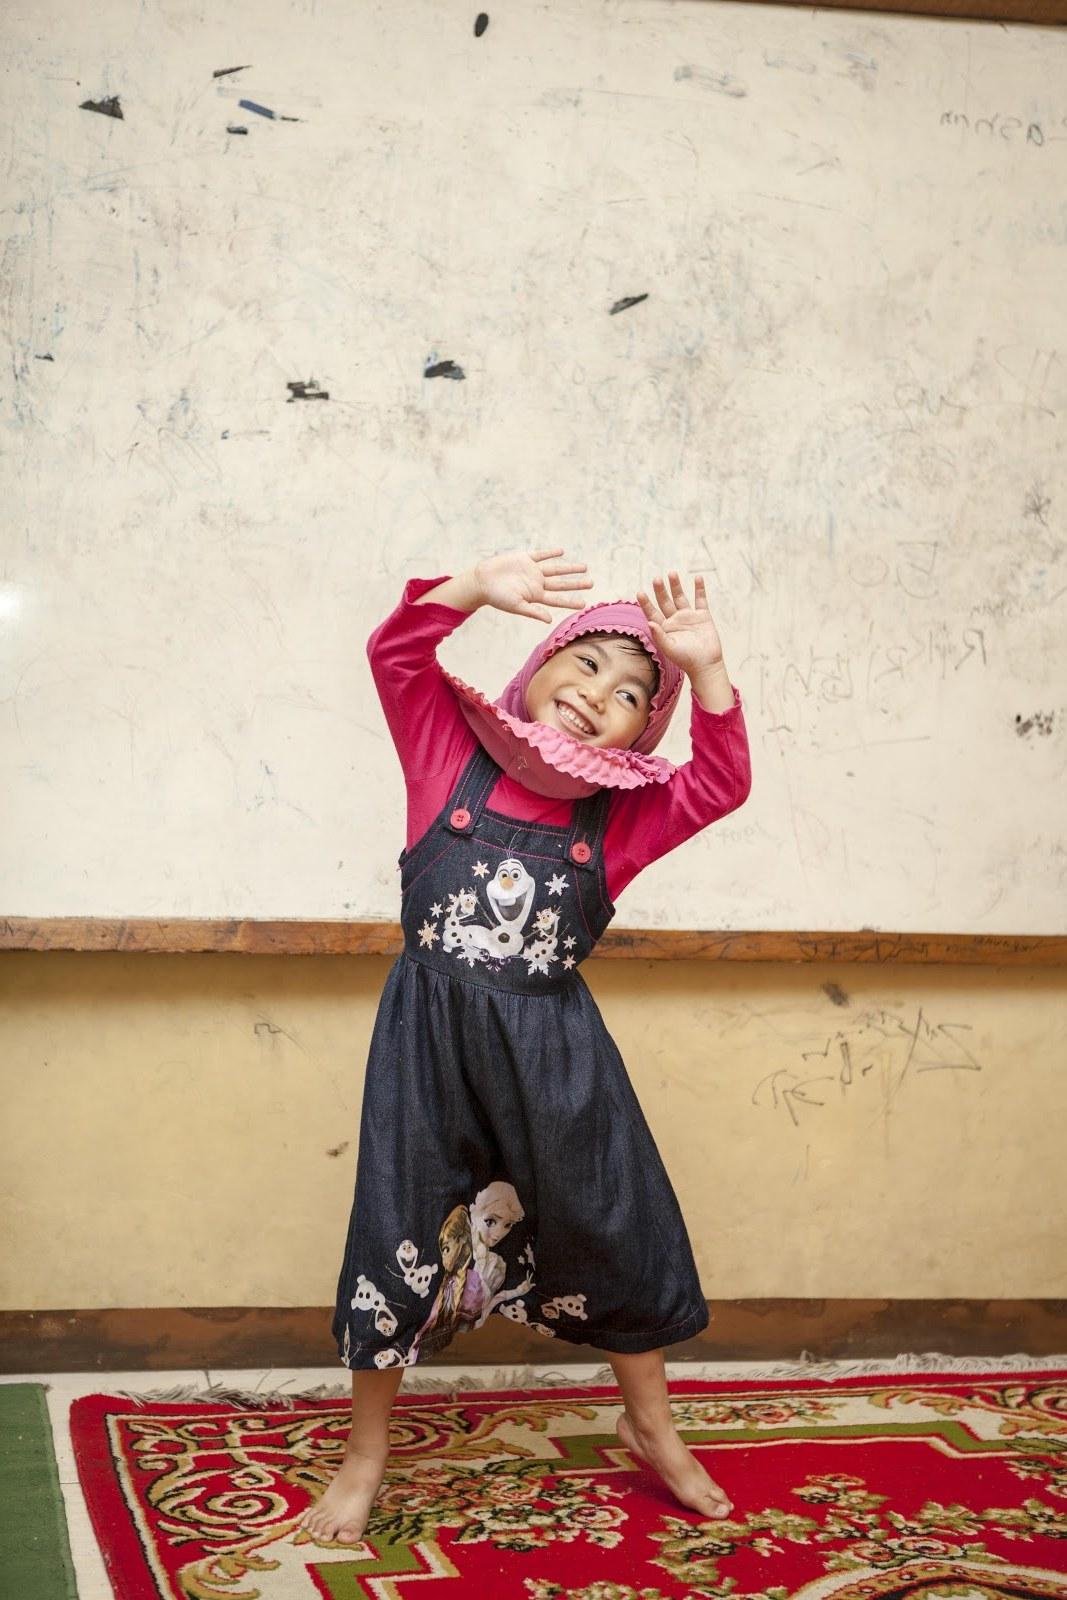 Design Baju Lebaran Baru Jxdu Baju Baru Untuk Lebaran Ribuan Yatim